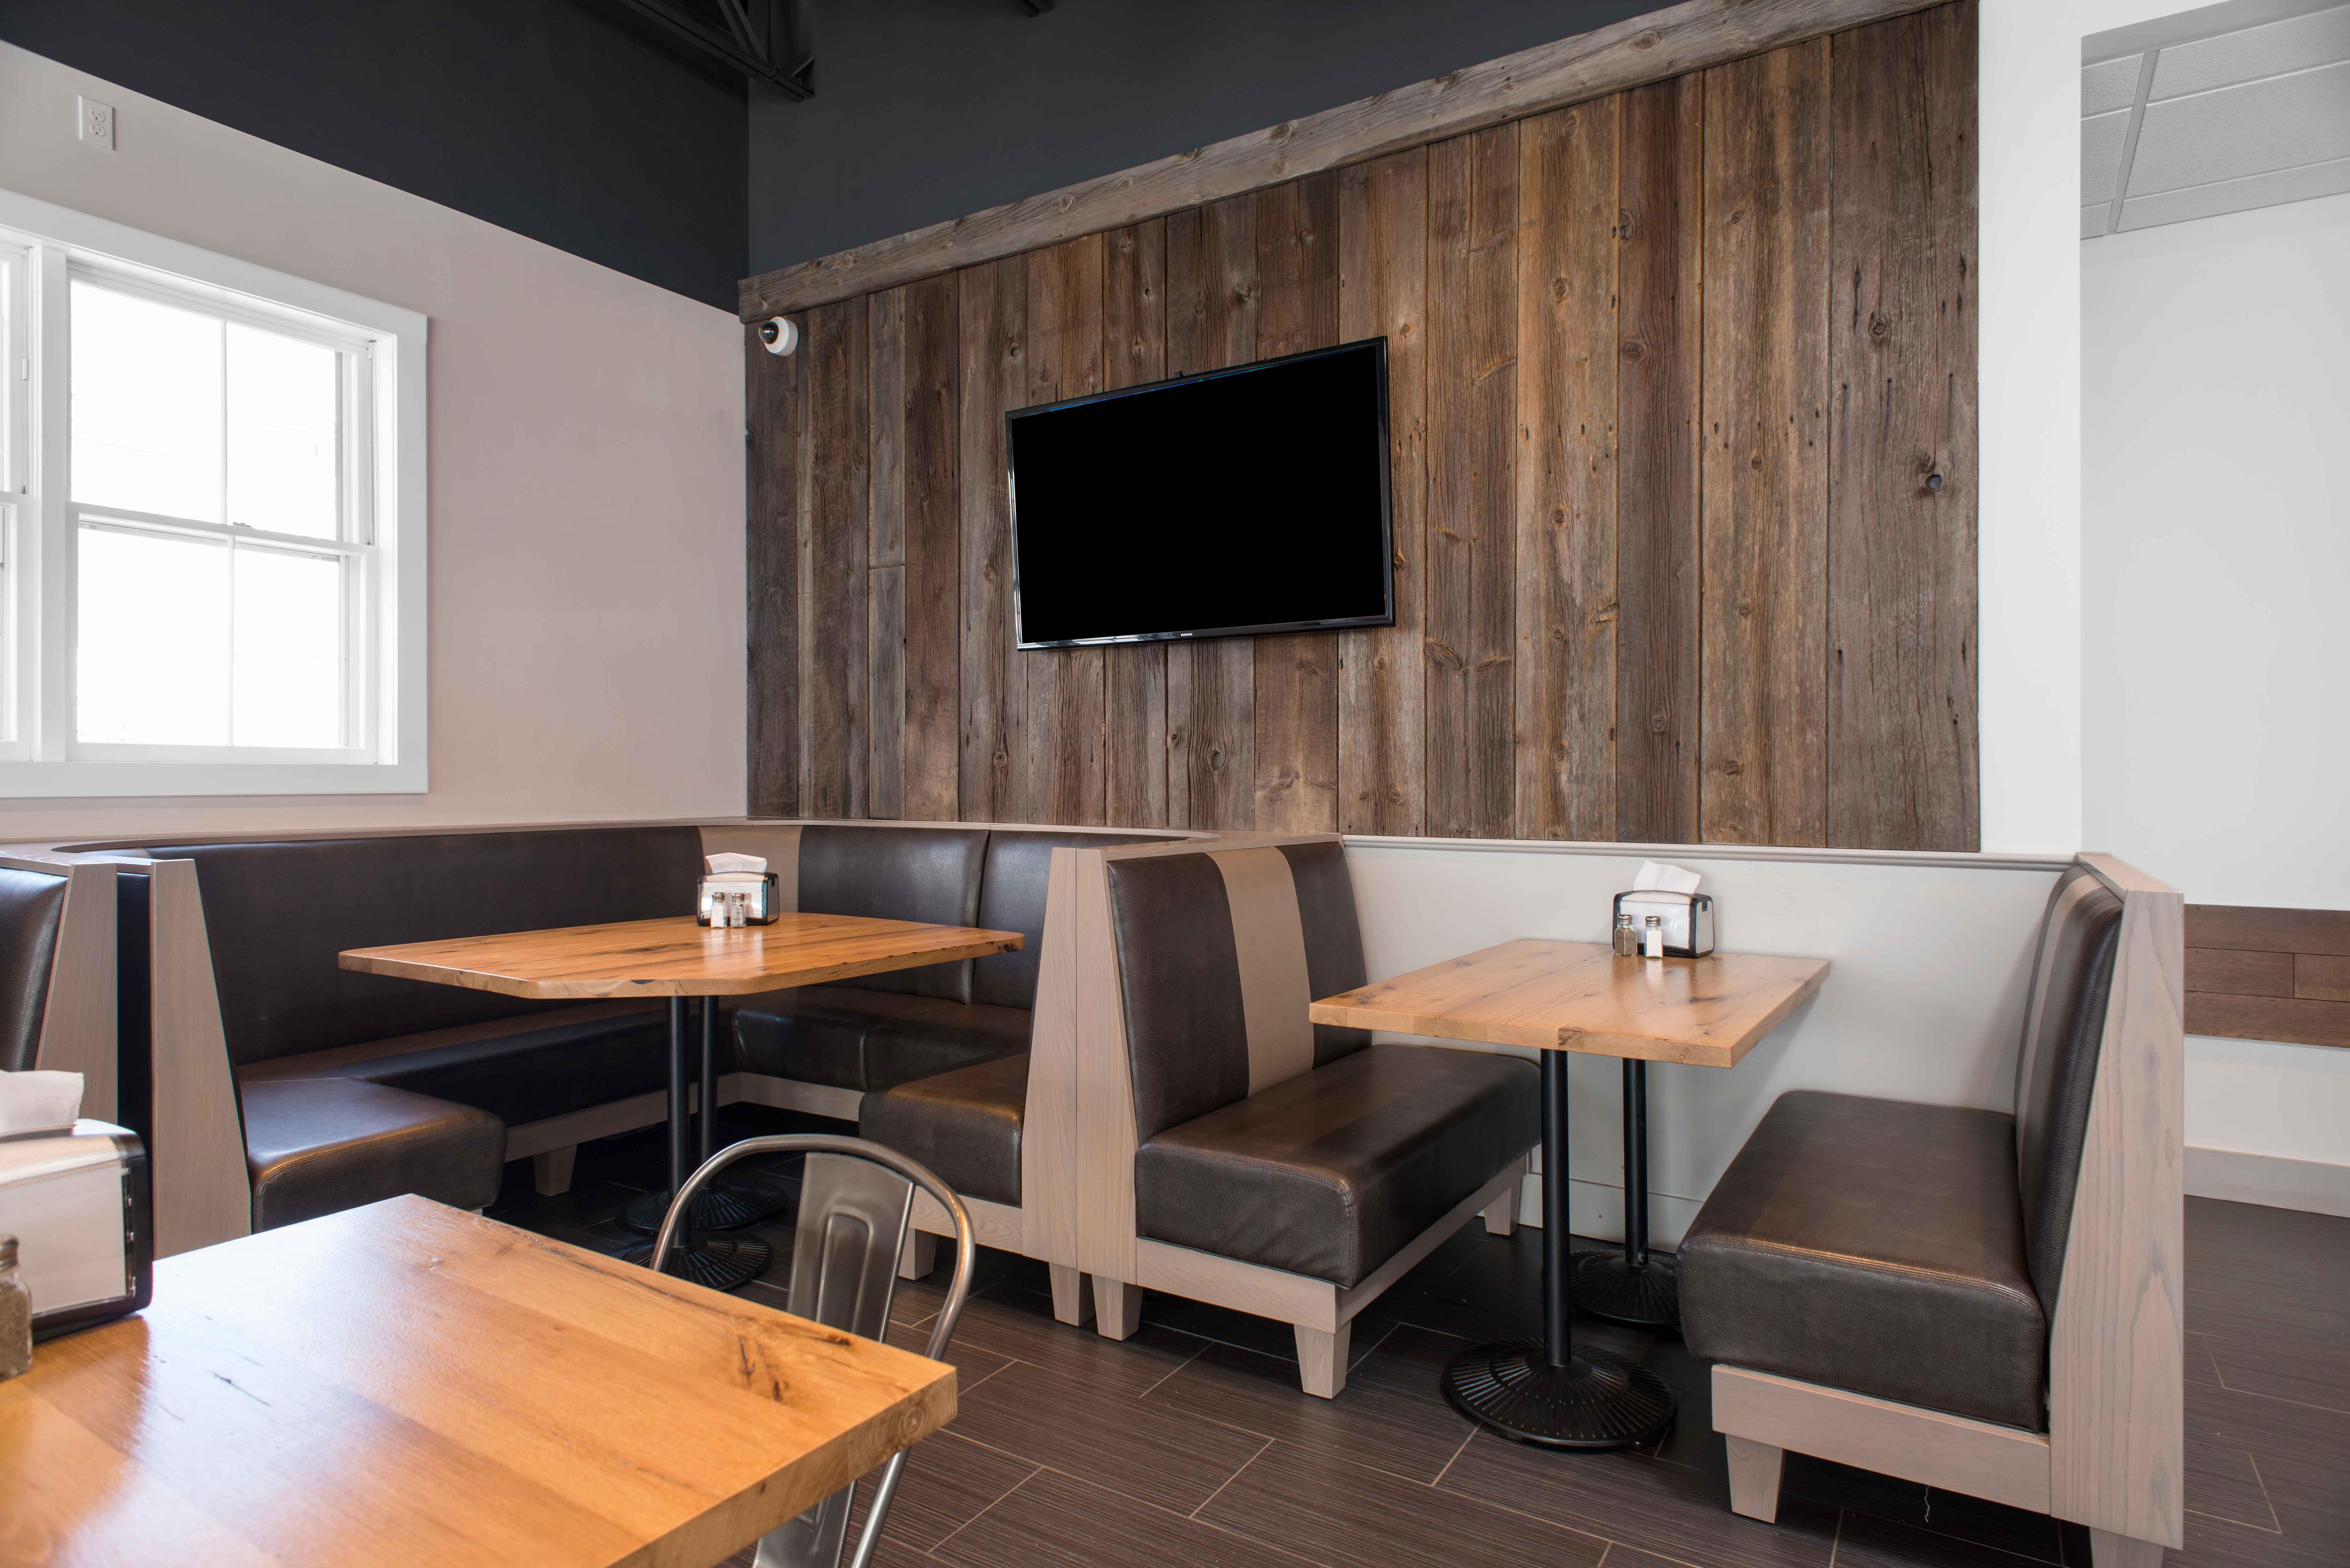 reclaimed com barnboardstore board wood interior barn mixed feature walls